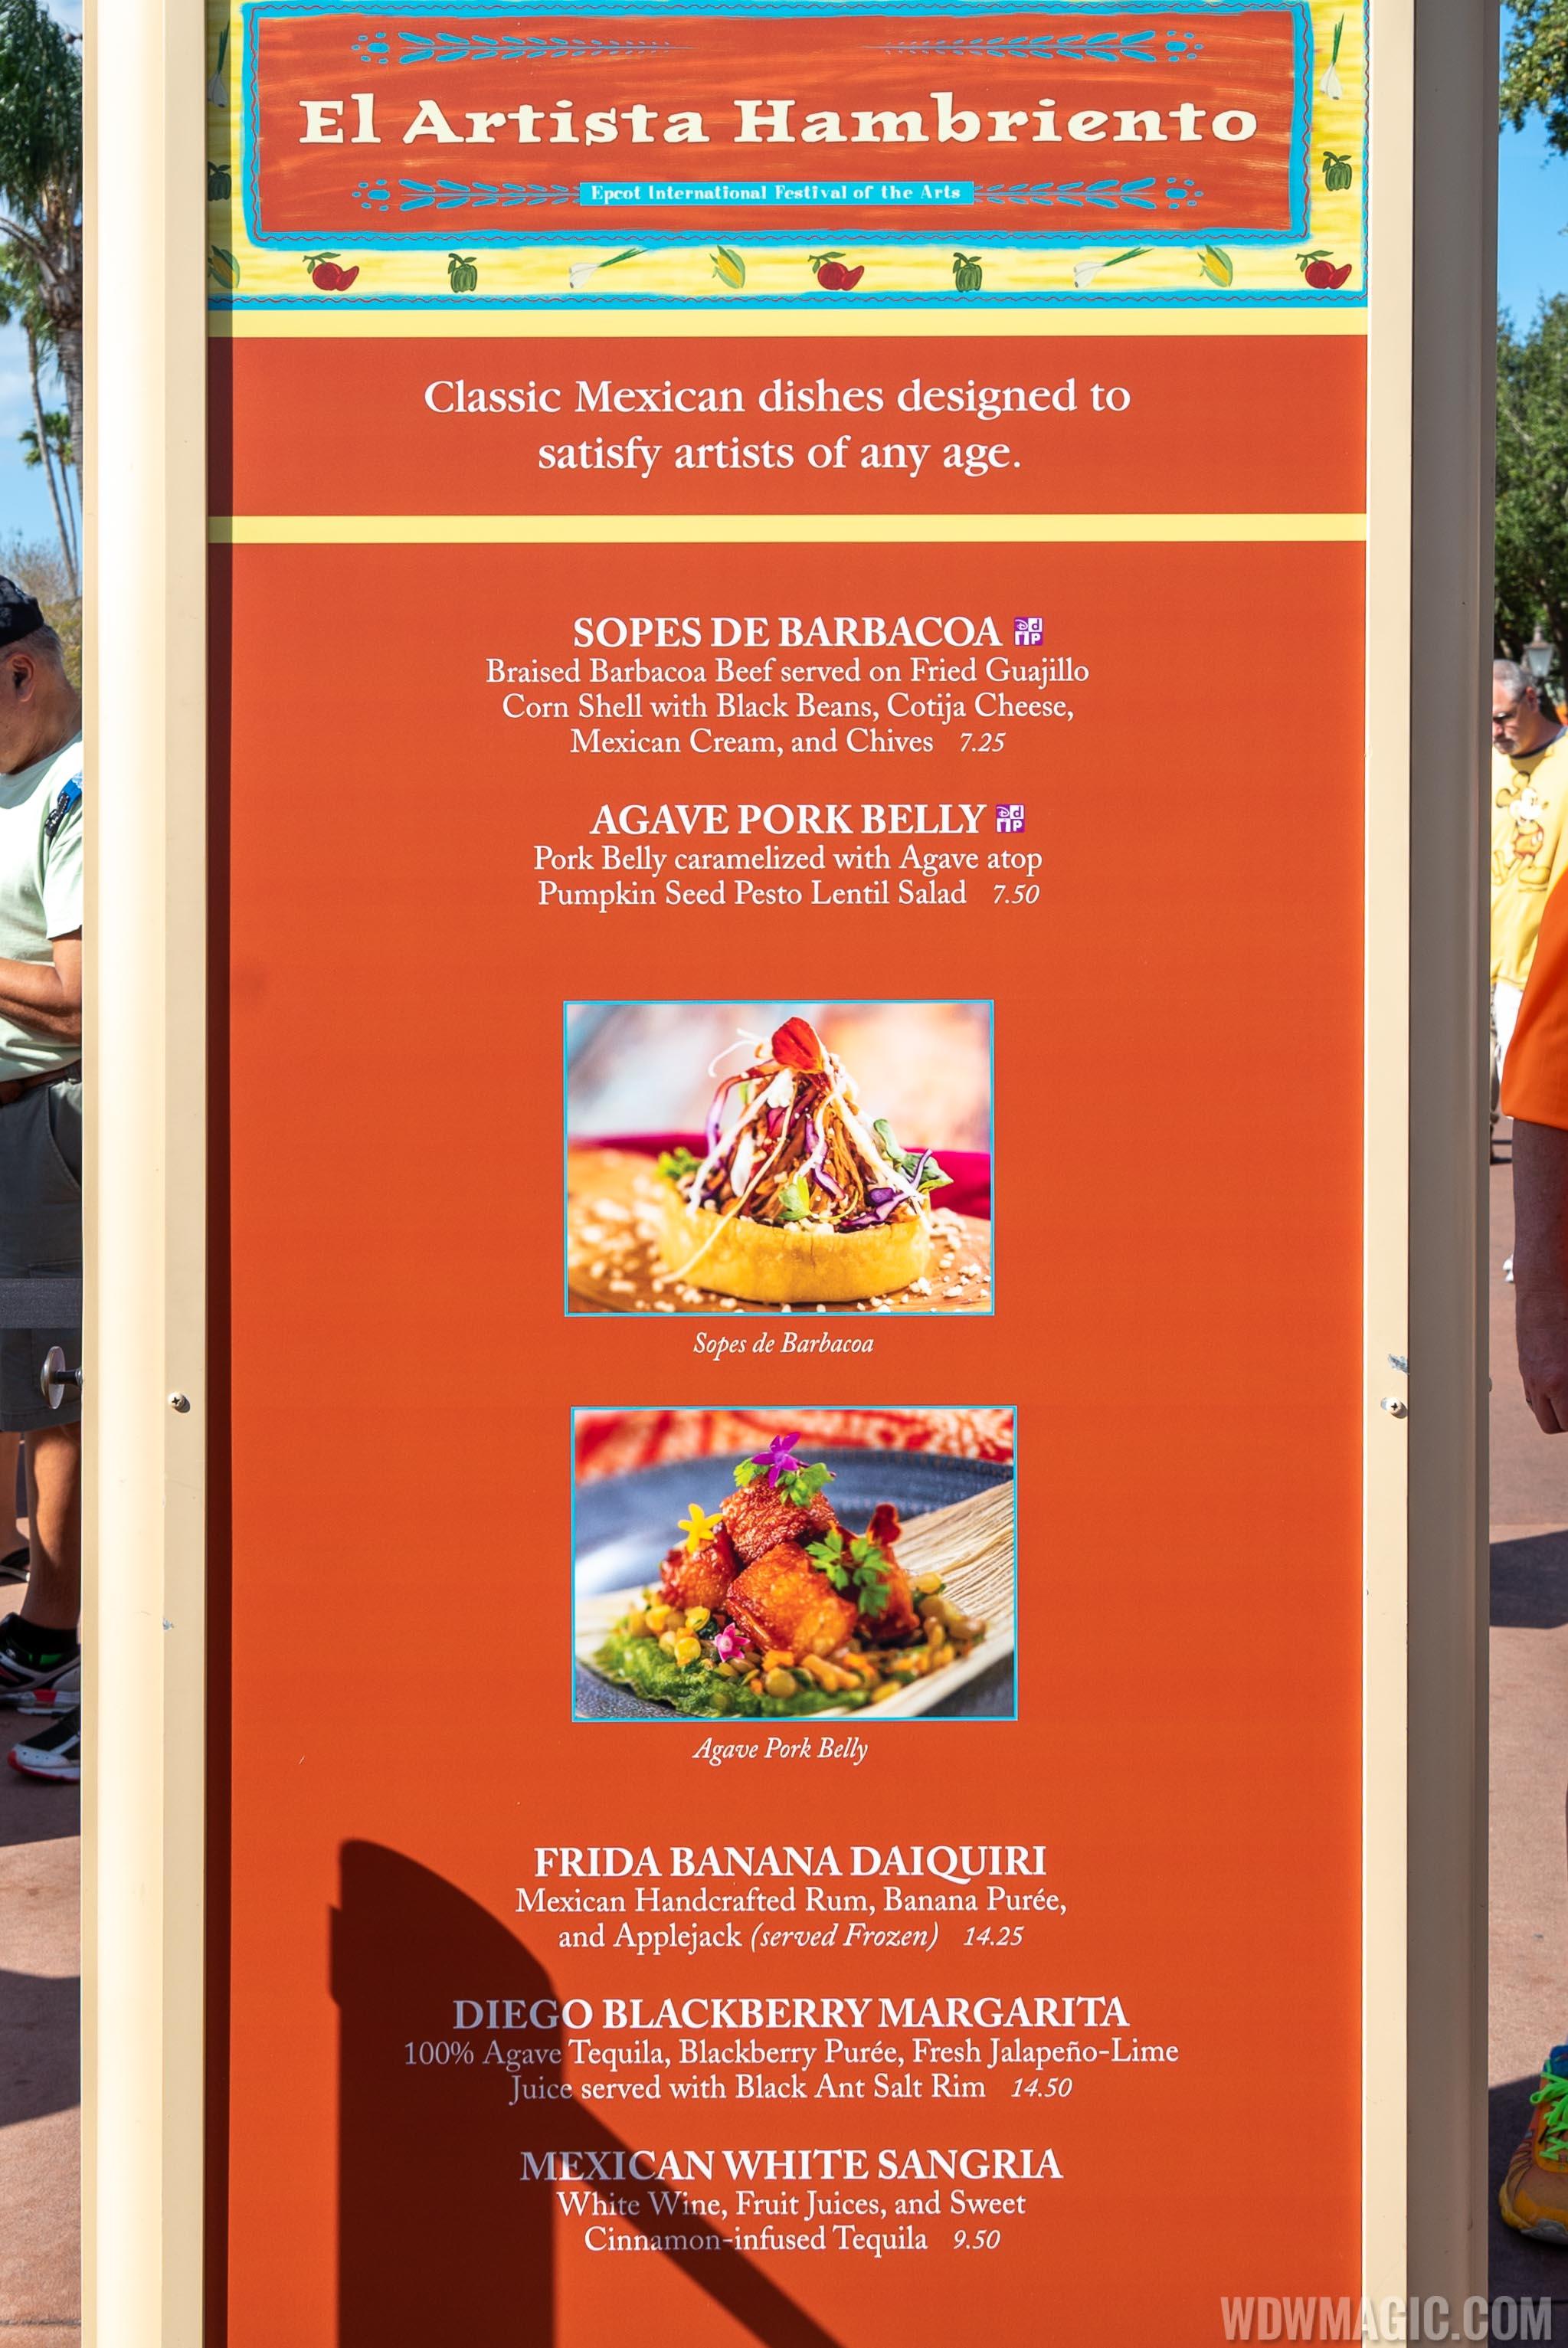 2020 Epcot Festival Of The Arts Food Studio Kiosks And Menus Photo 20 Of 24